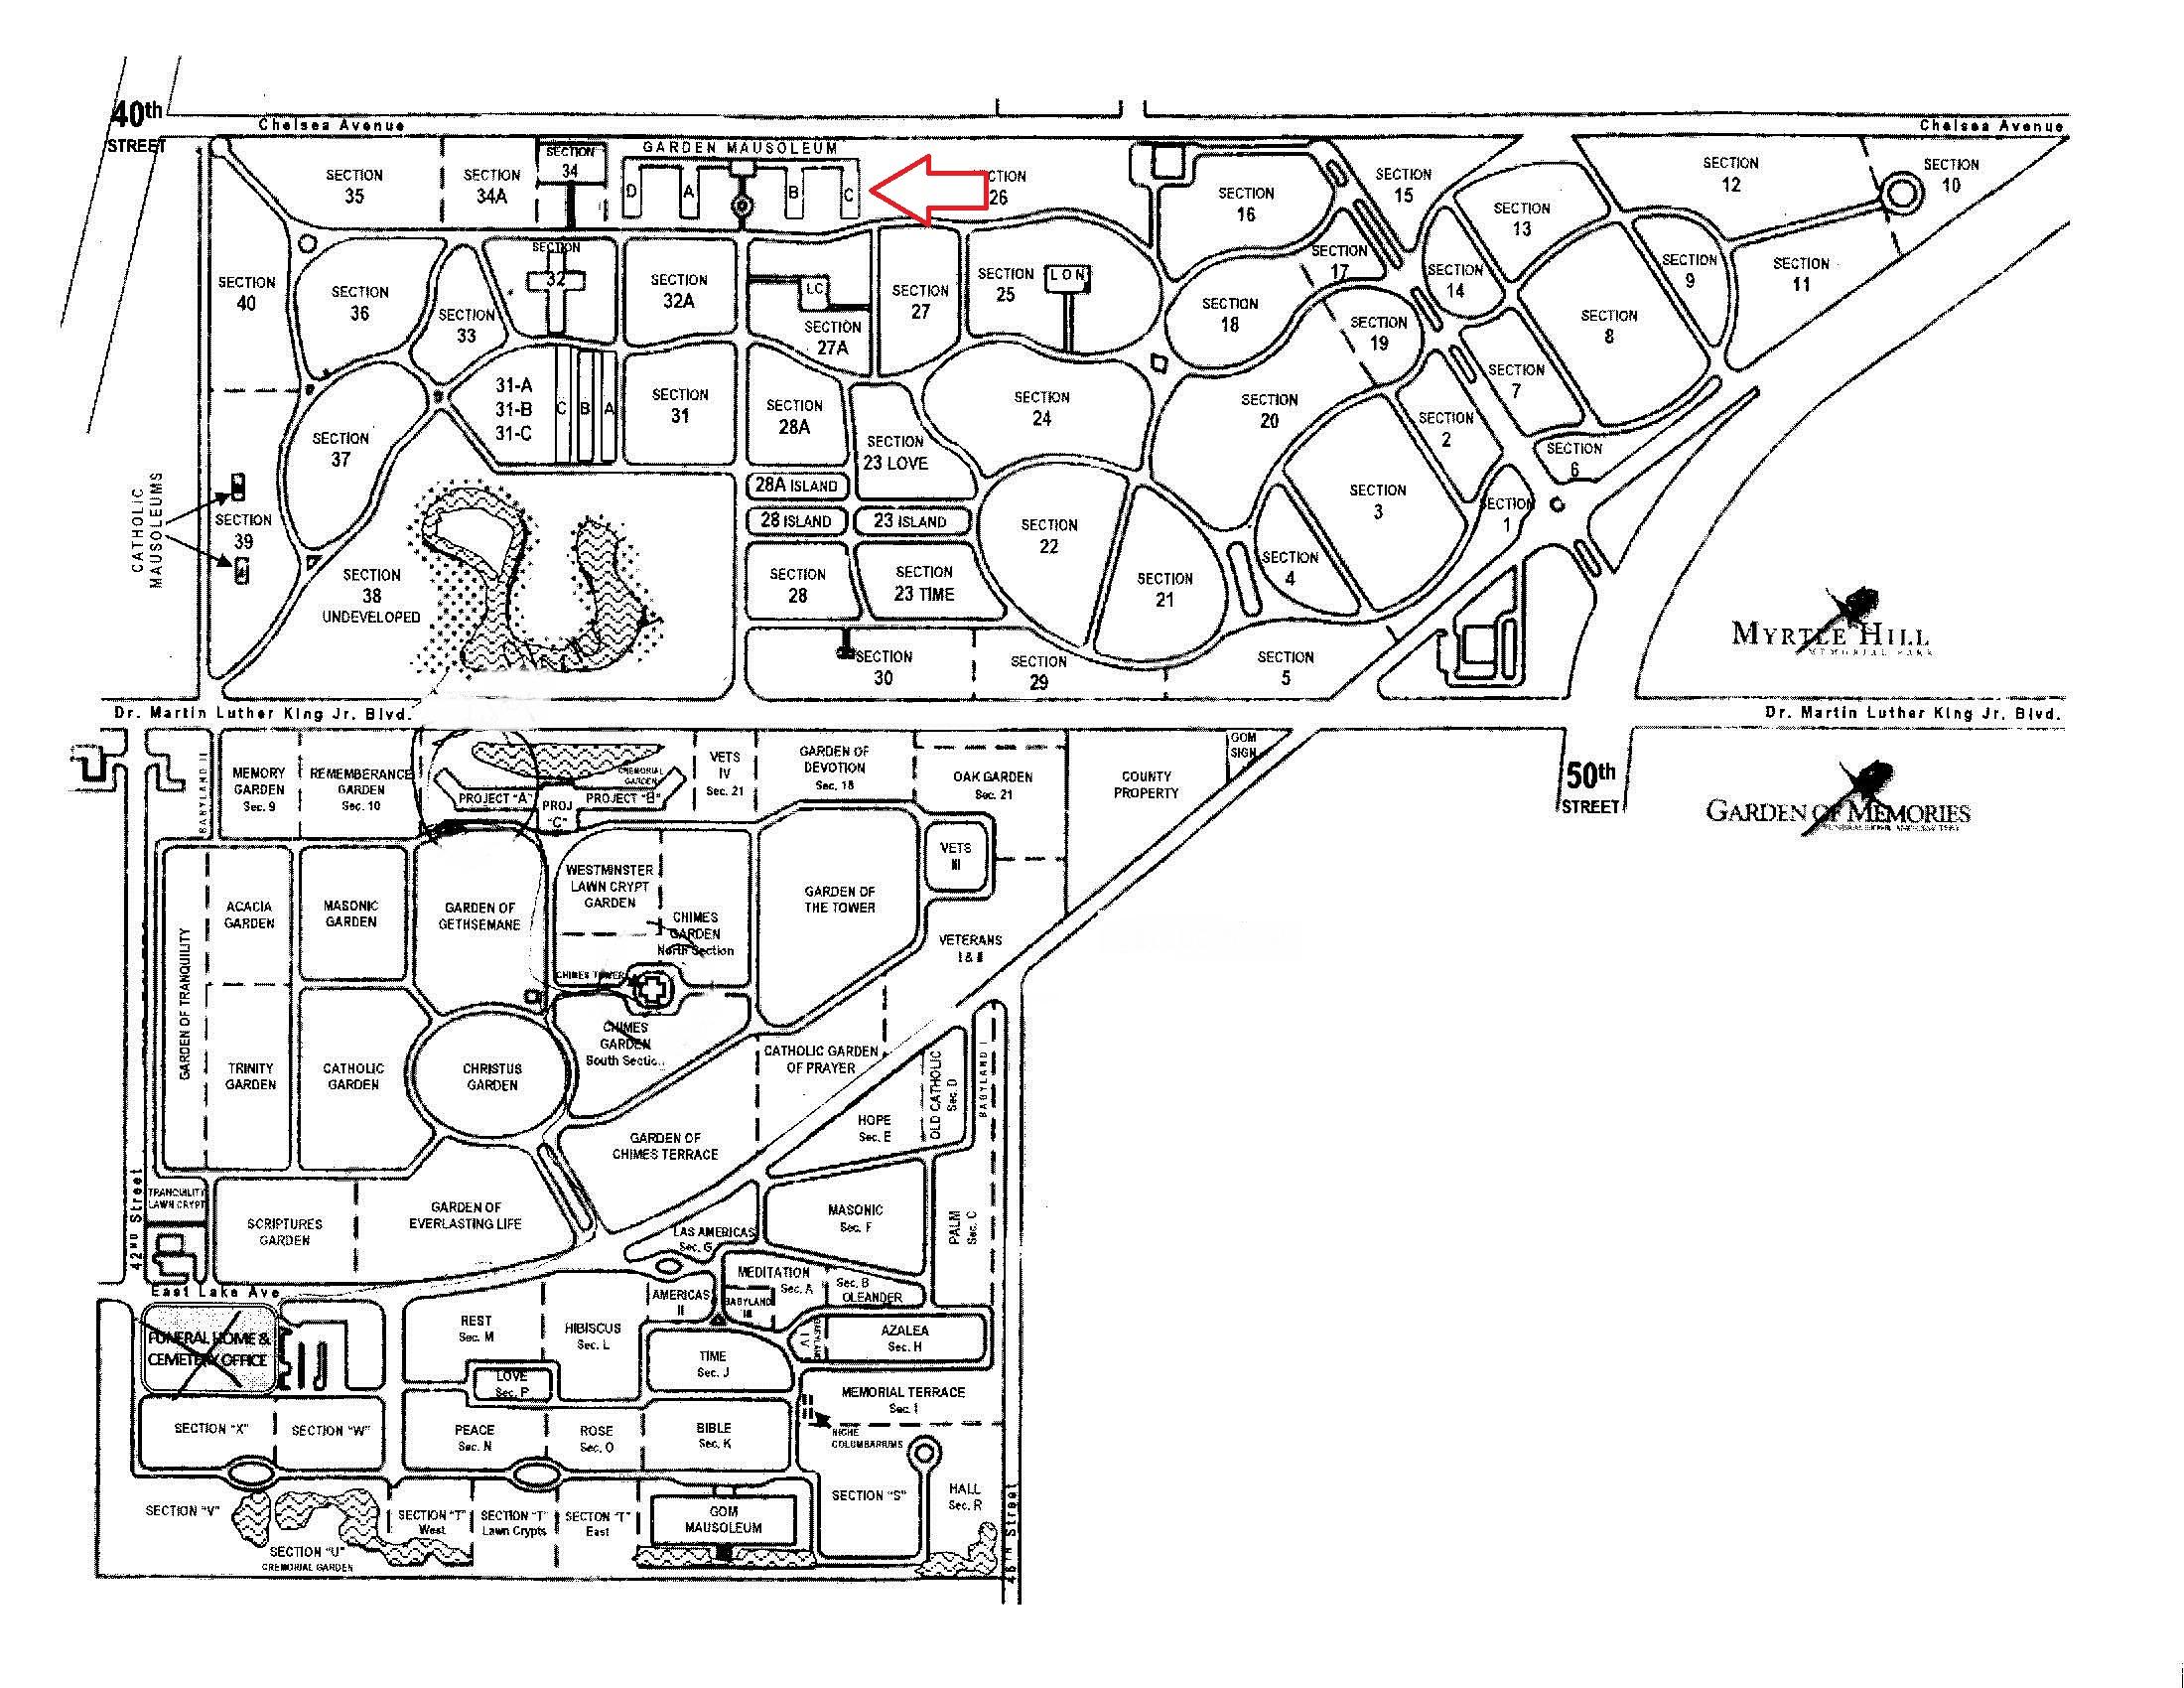 Myrtle Hill Cemetery FANNIES YOUR AUNT - Florida map plant city